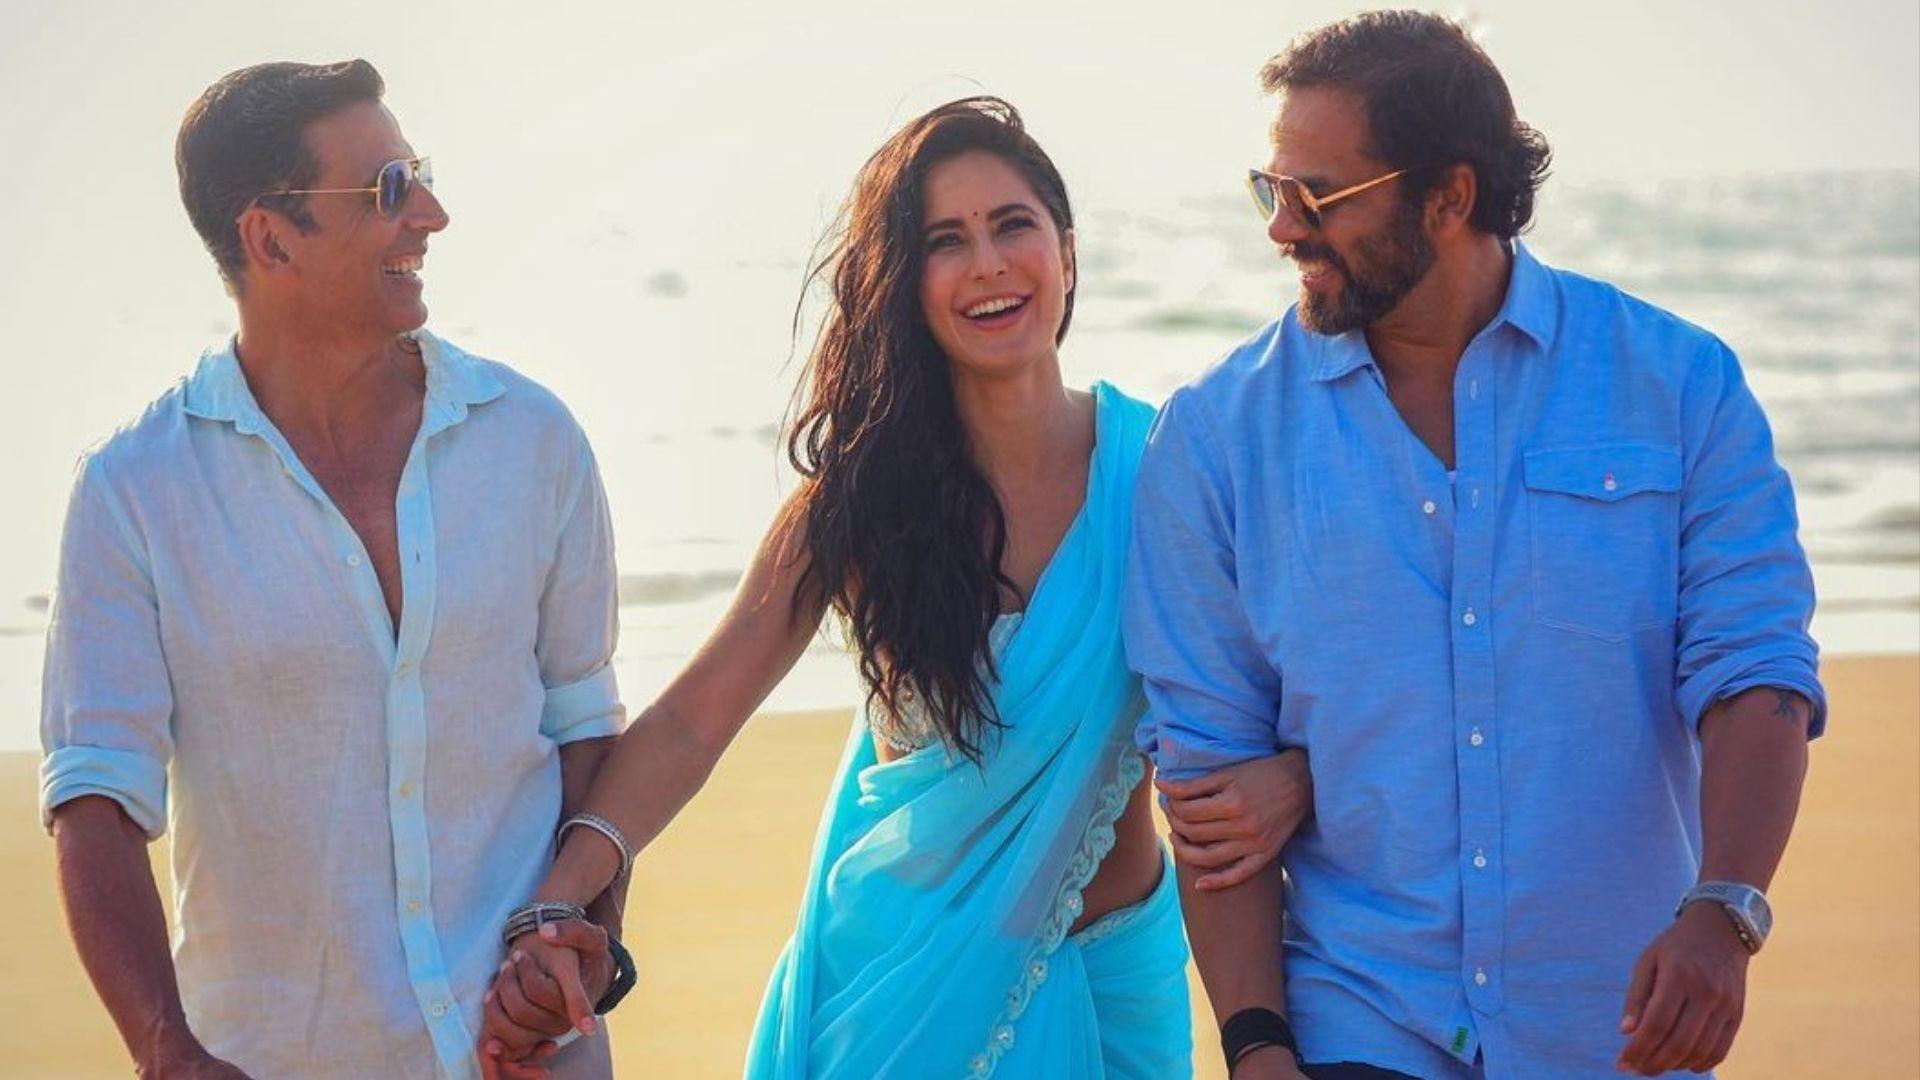 Sooryavanshi: Countdown For Rohit Shetty's Cop Universe Film Begins! Director Shares Photo With Akshay Kumar And Katrina Kaif